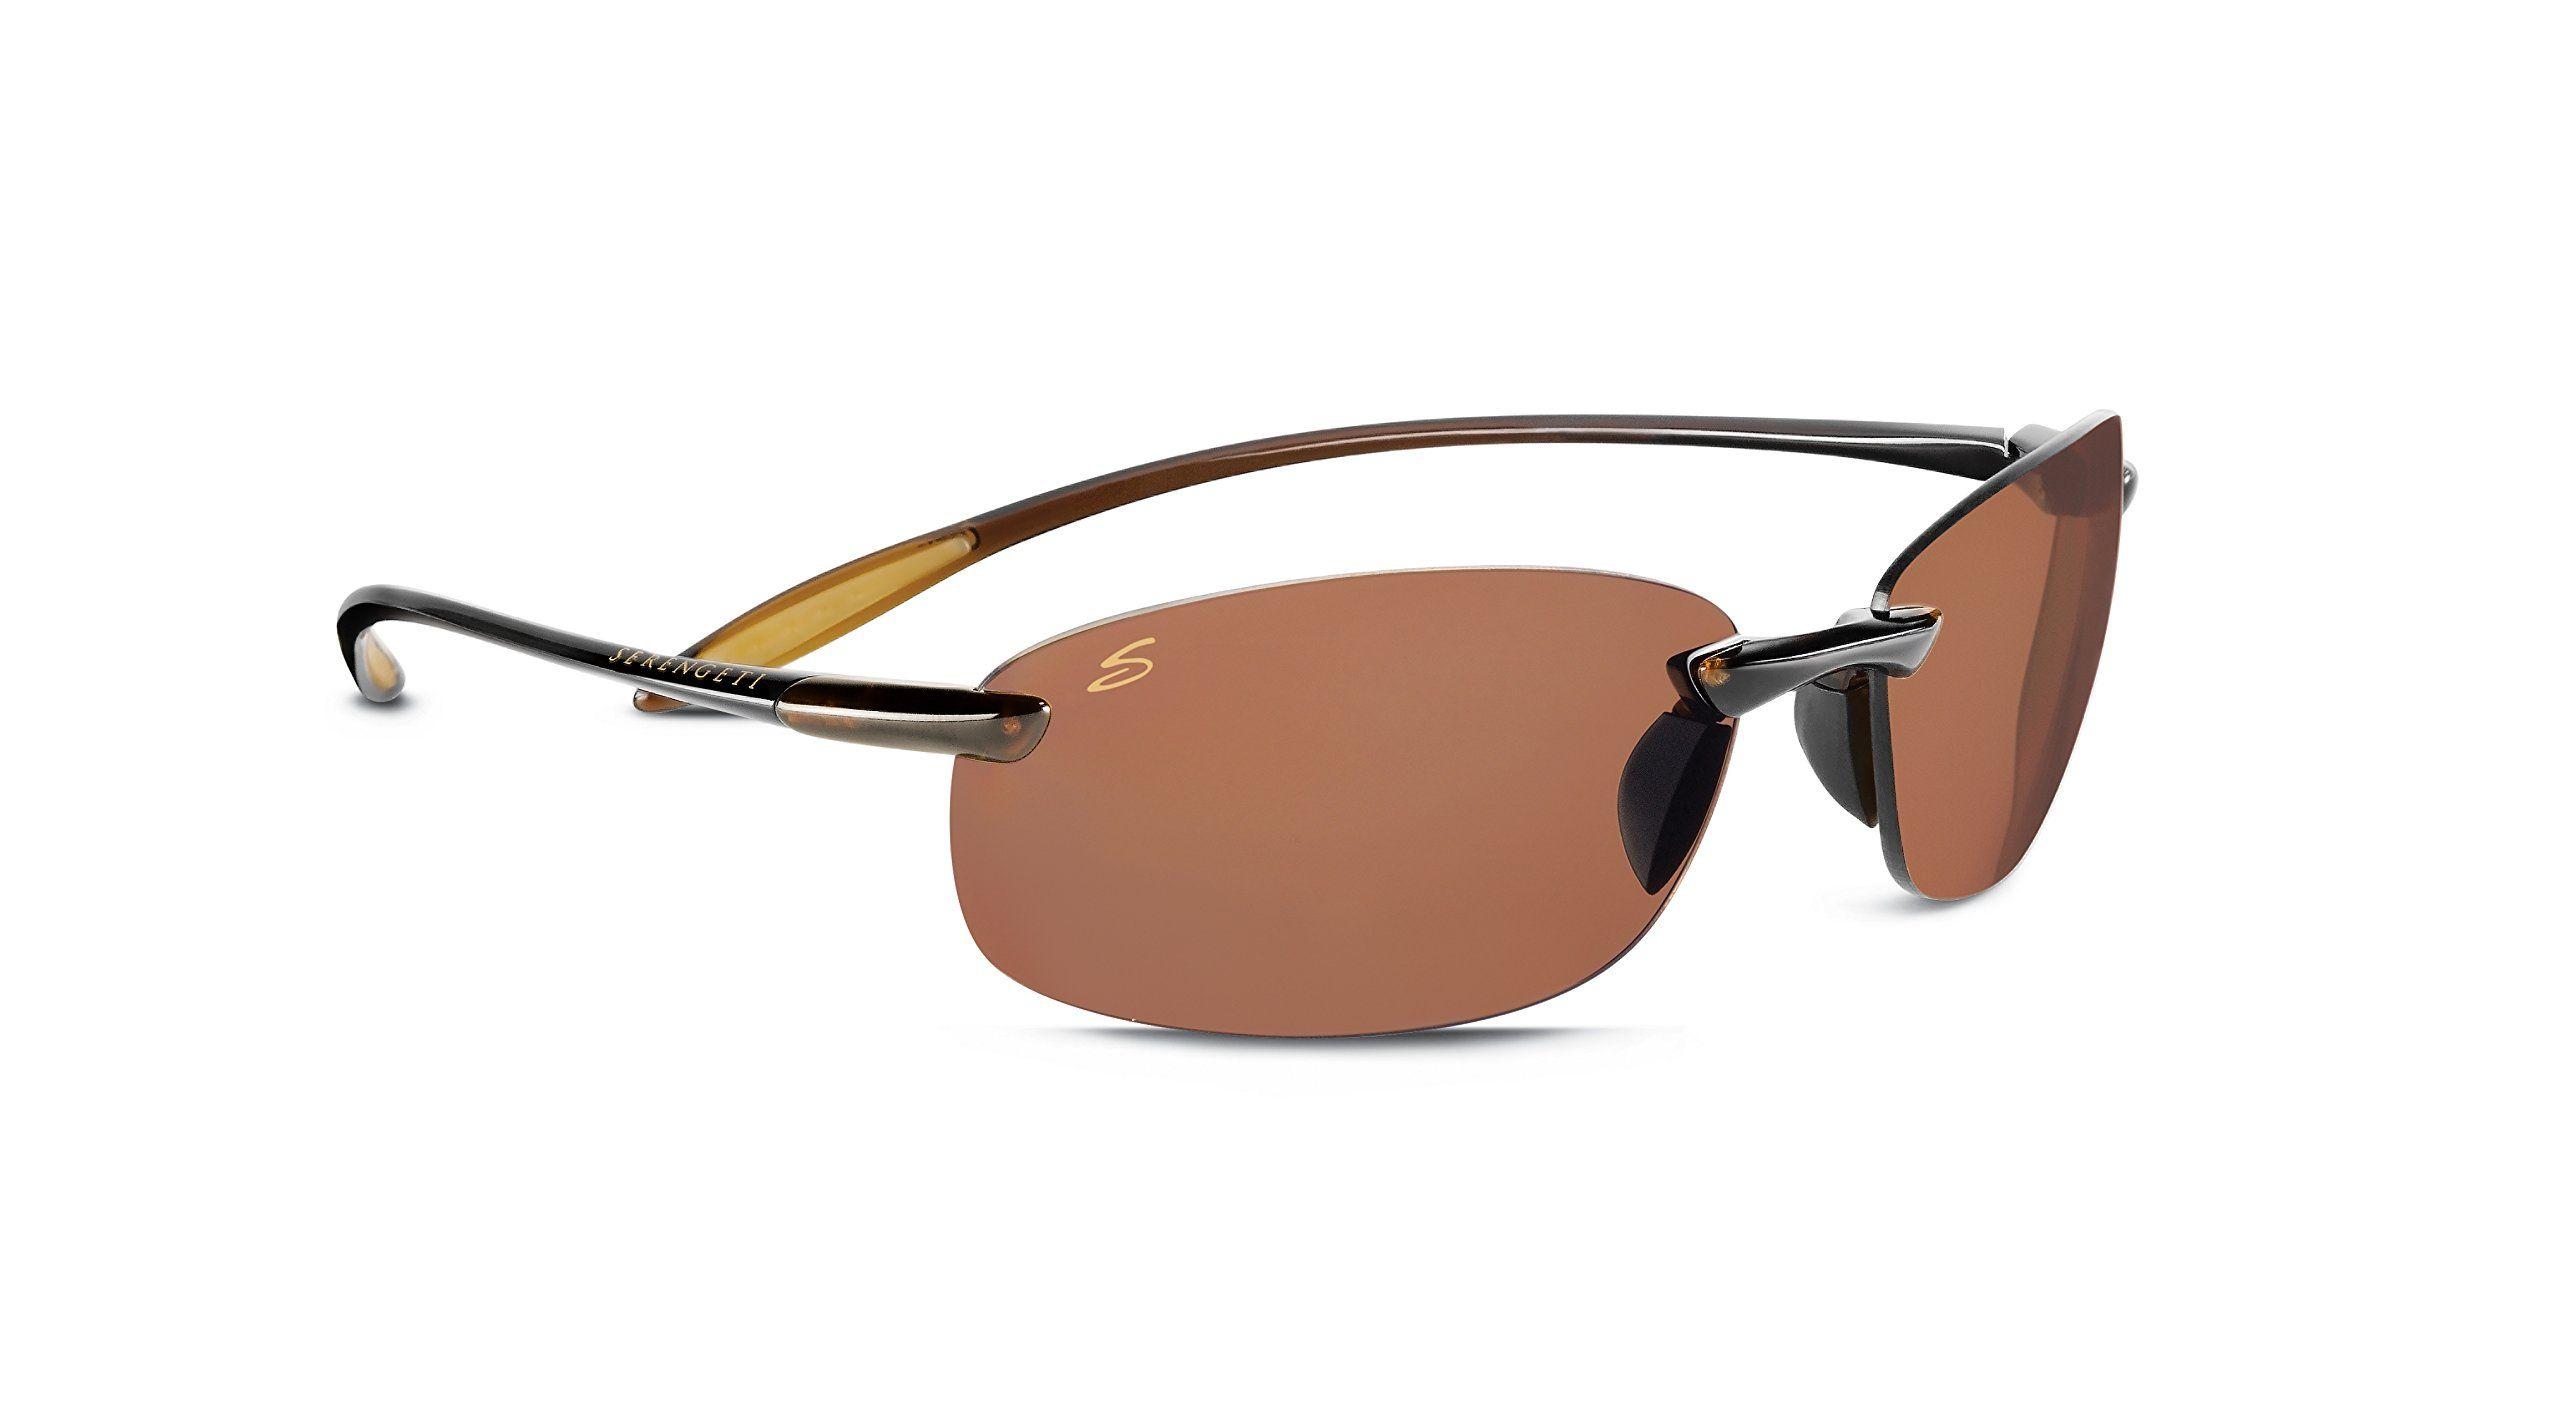 711a1138fe Serengeti Nuvino Polar Sunglasses